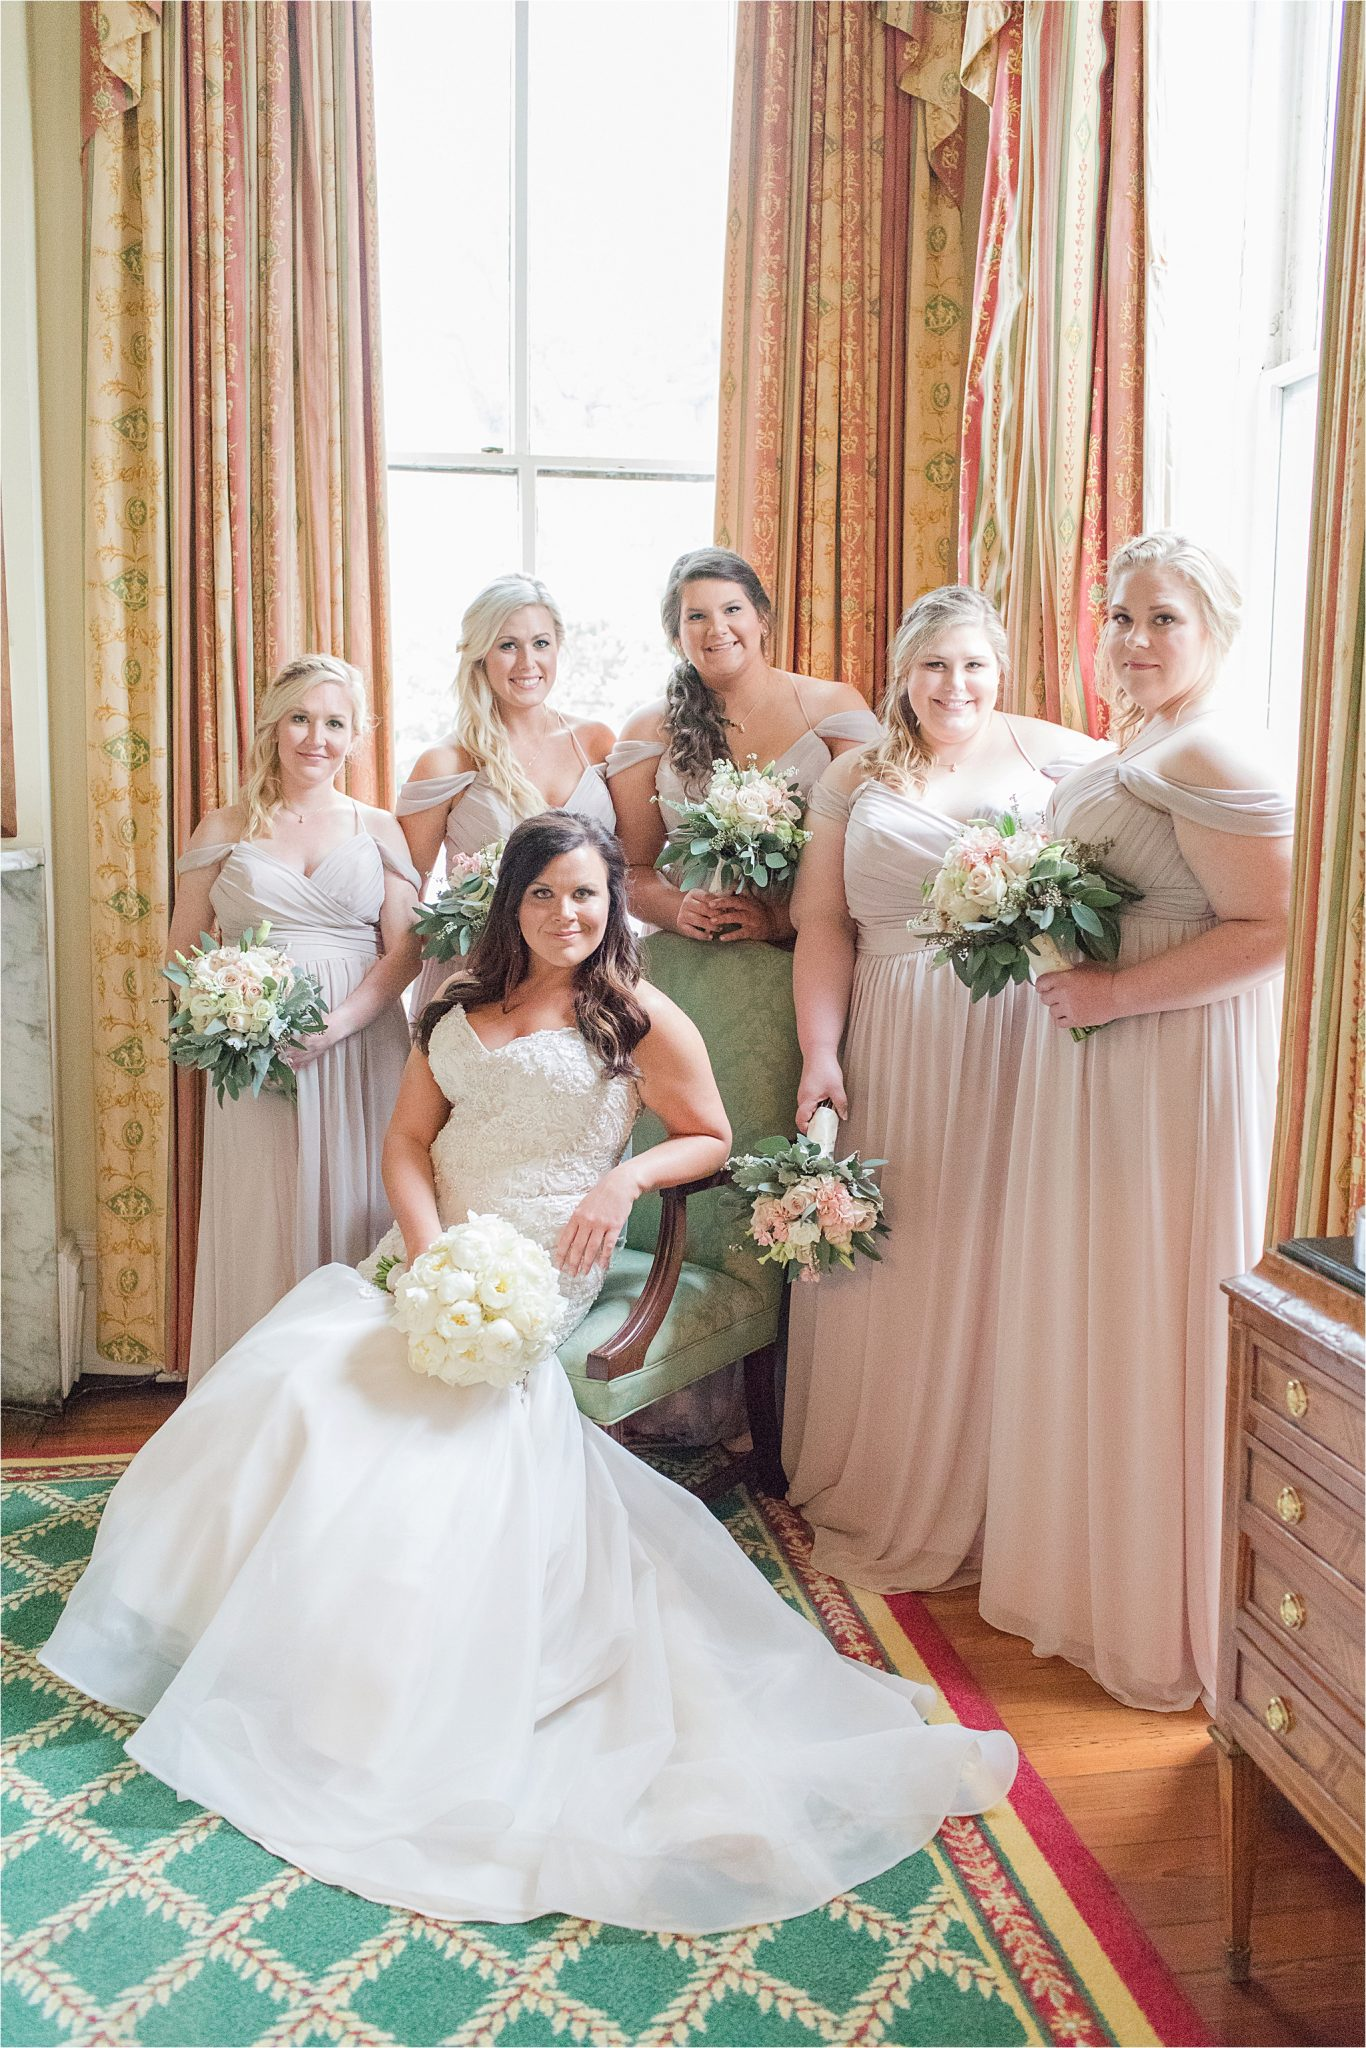 bridesmaids and flower girl-neutral long bridesmaid-wedding neutrals-wedding party-bride and her bridesmaids